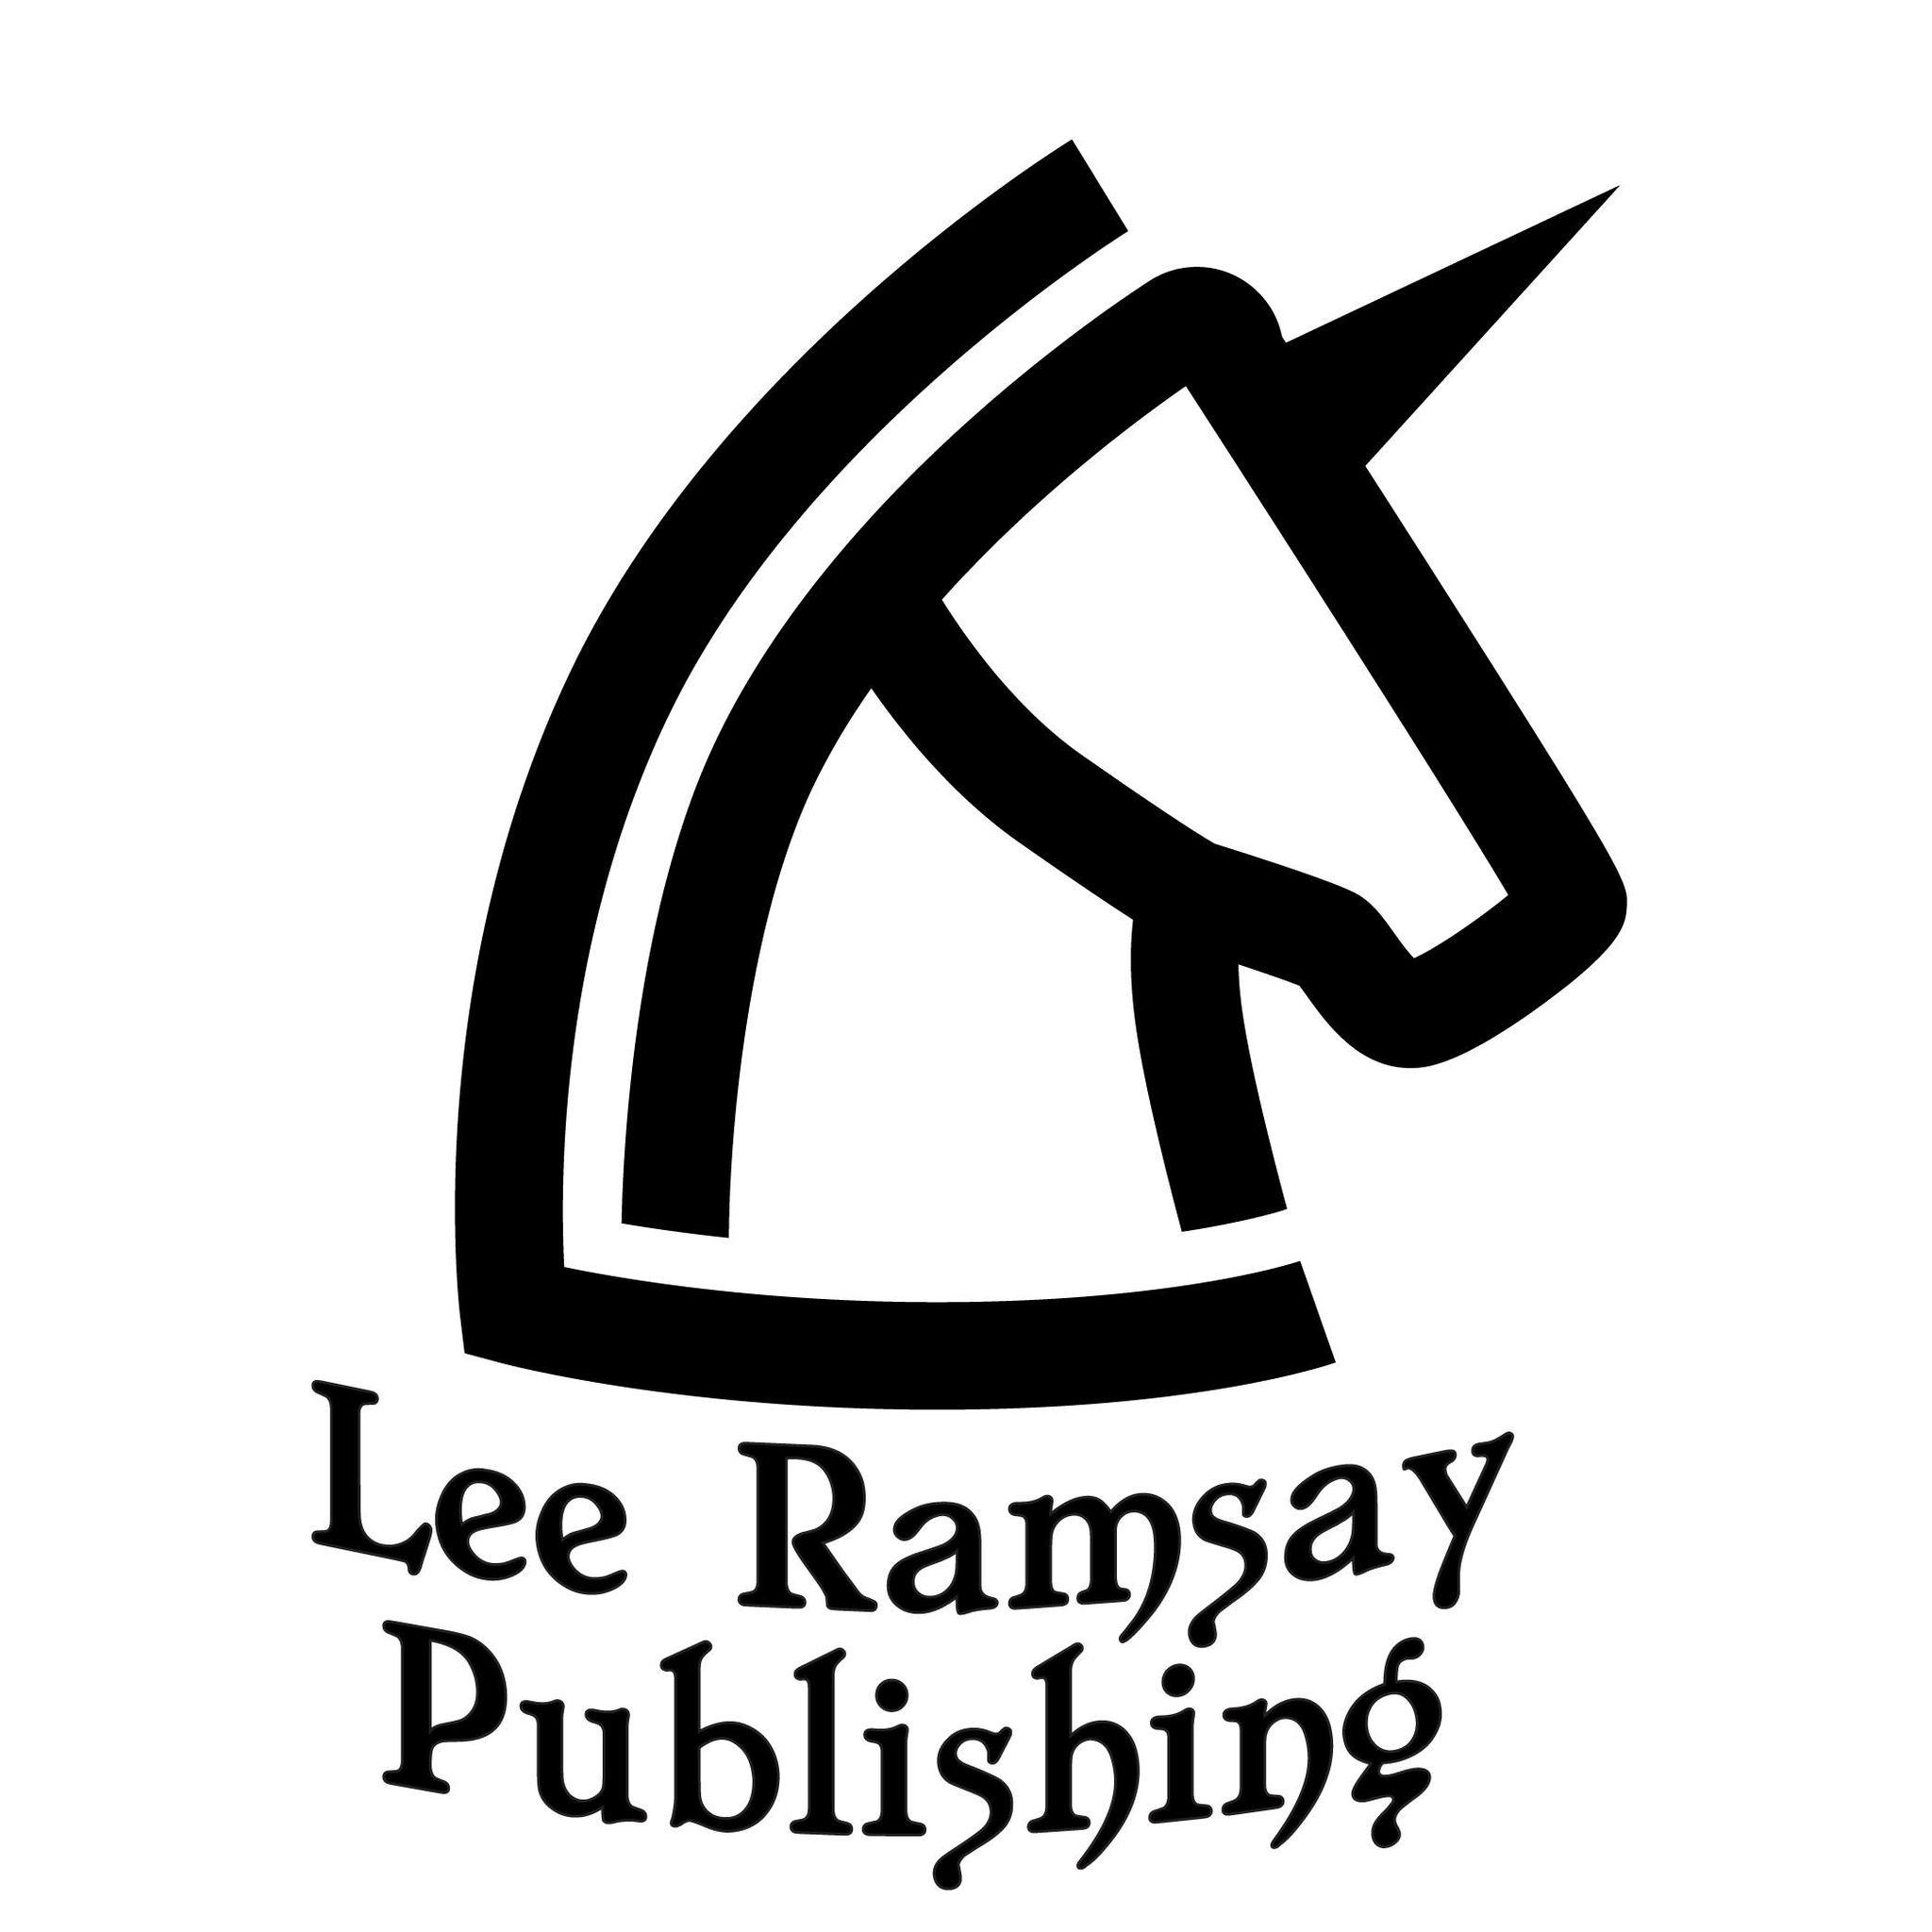 Lee Ramsay Publishing